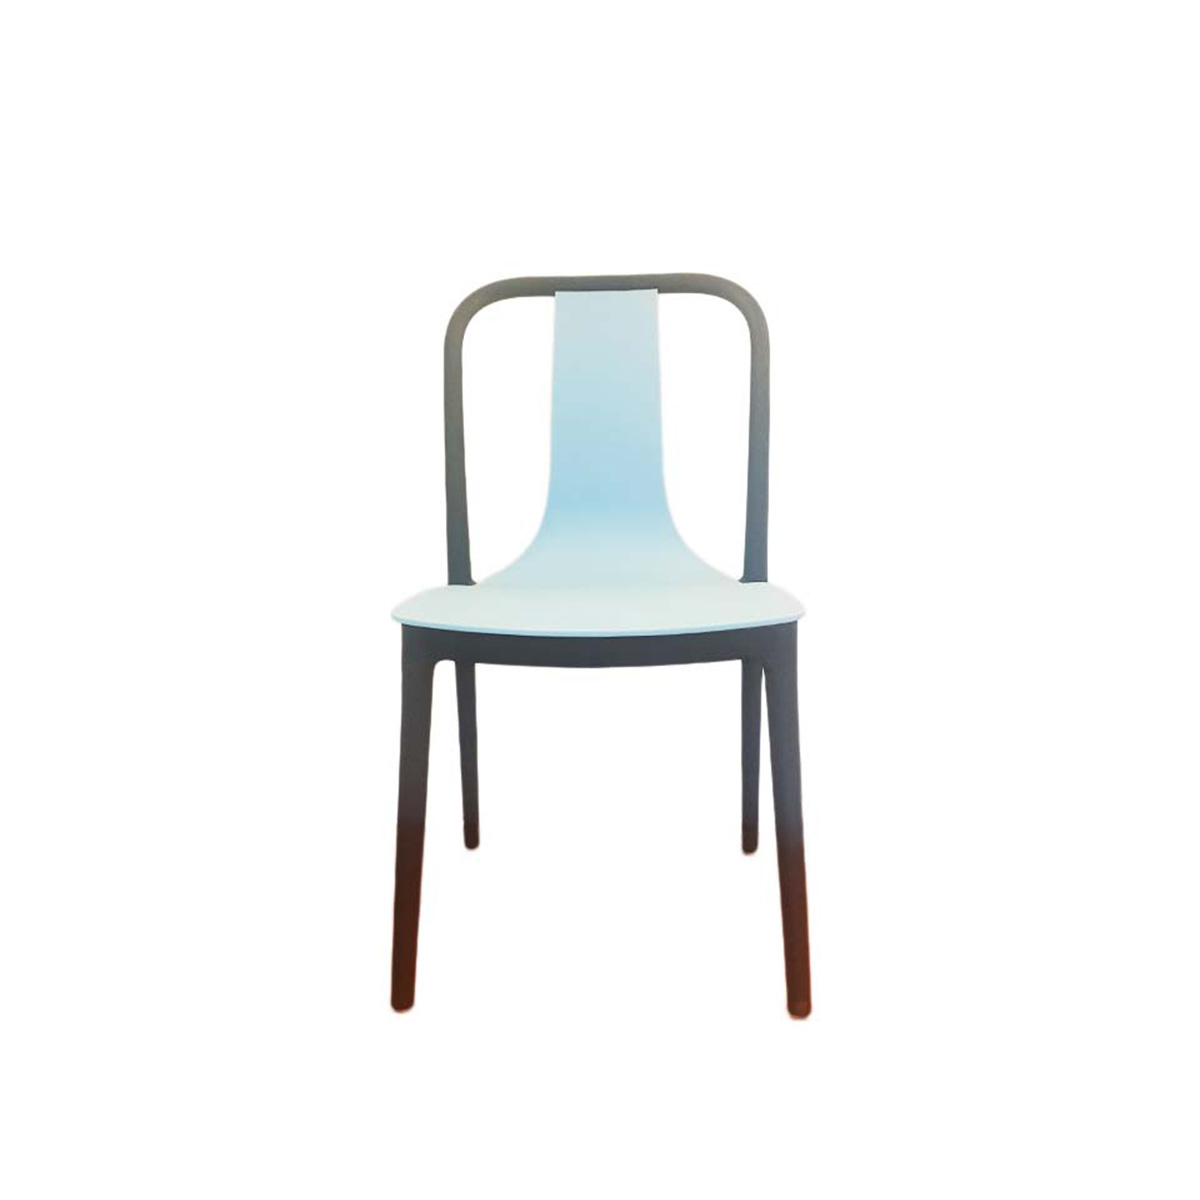 Stolica CHJ-204B plava